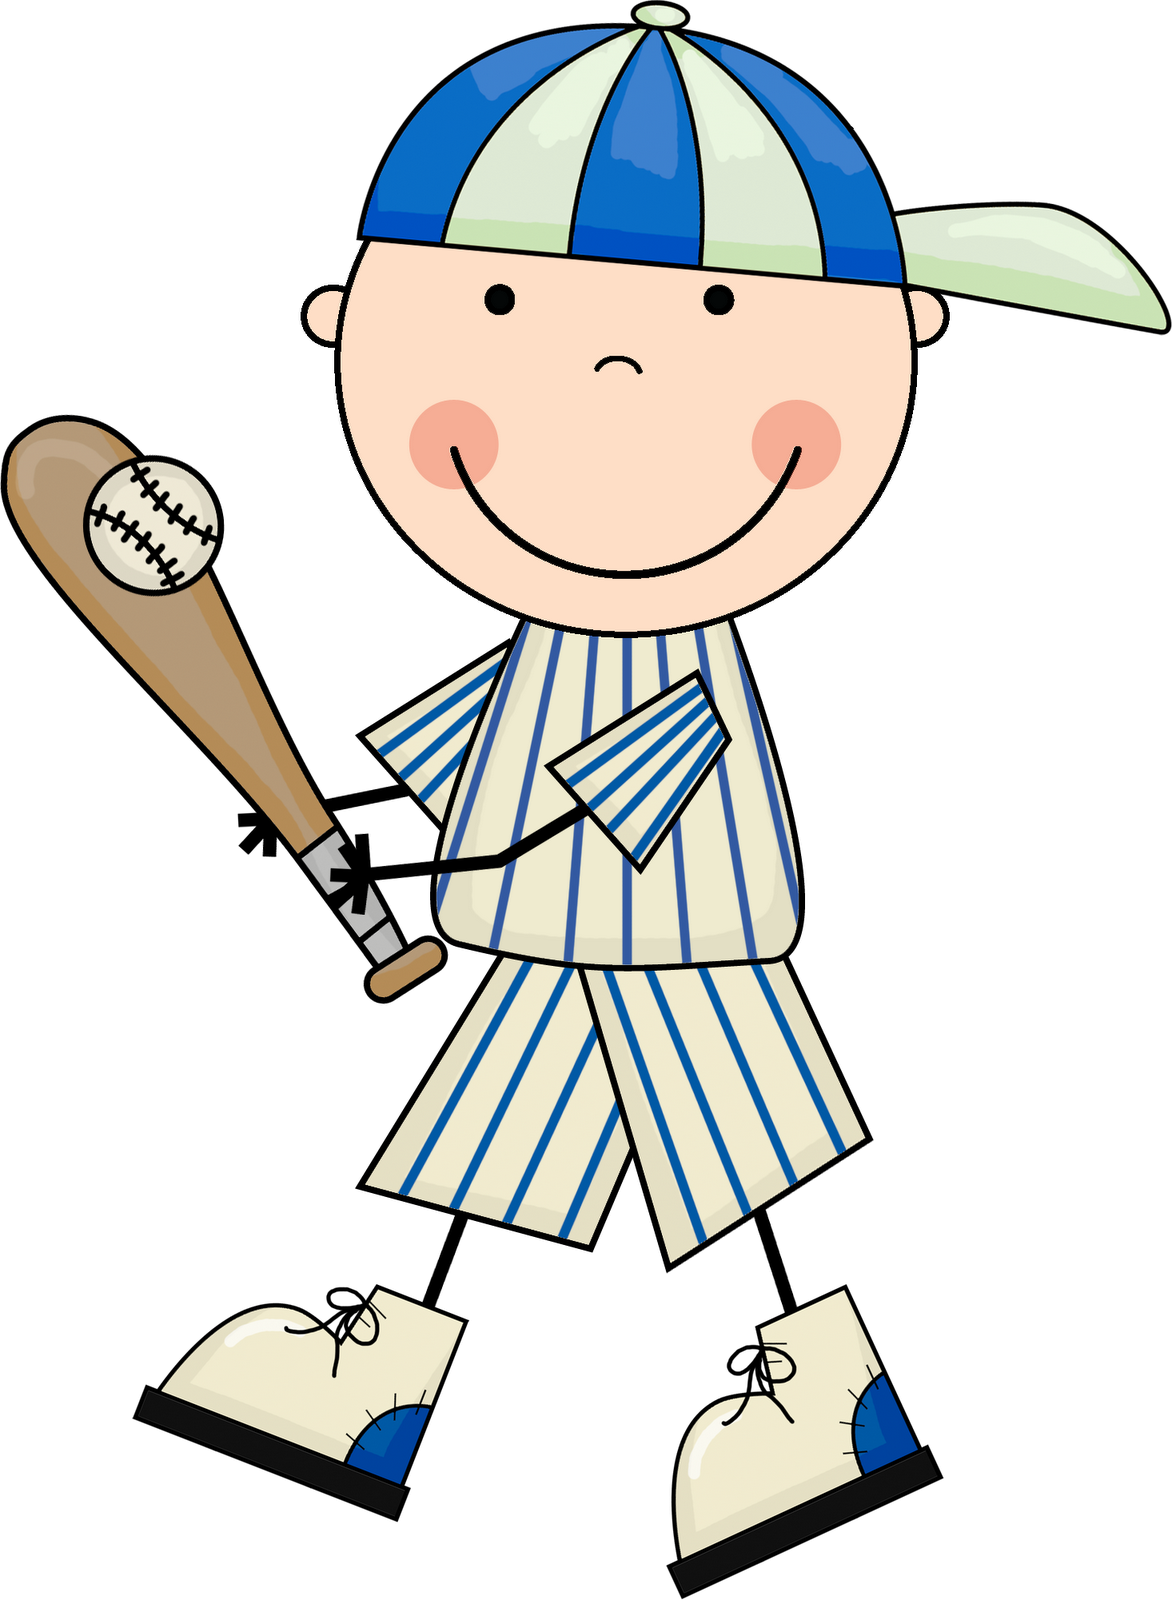 Baseball Pictures Clip Art School Clipar-Baseball Pictures Clip Art School Clipart-16